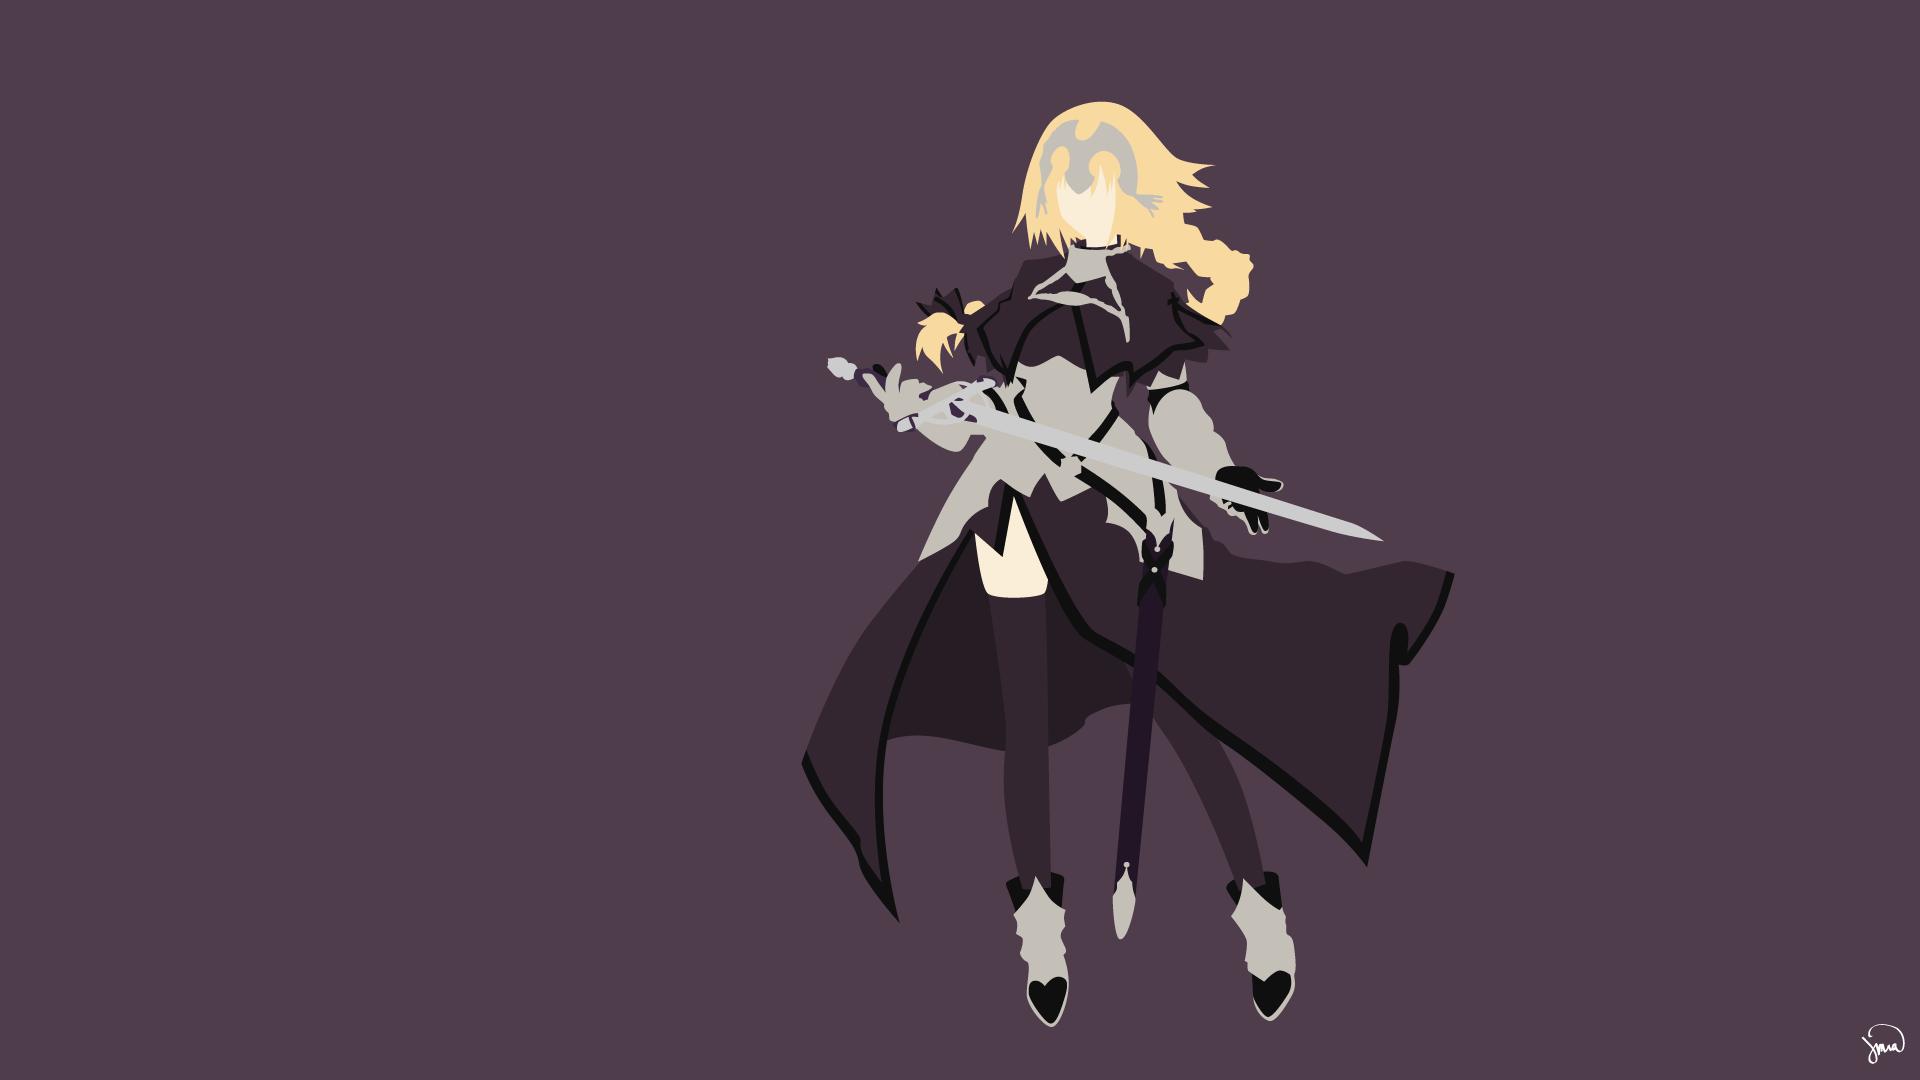 Fate Apocrypha anime girls Ruler Fate Apocrypha Jeanne d Arc